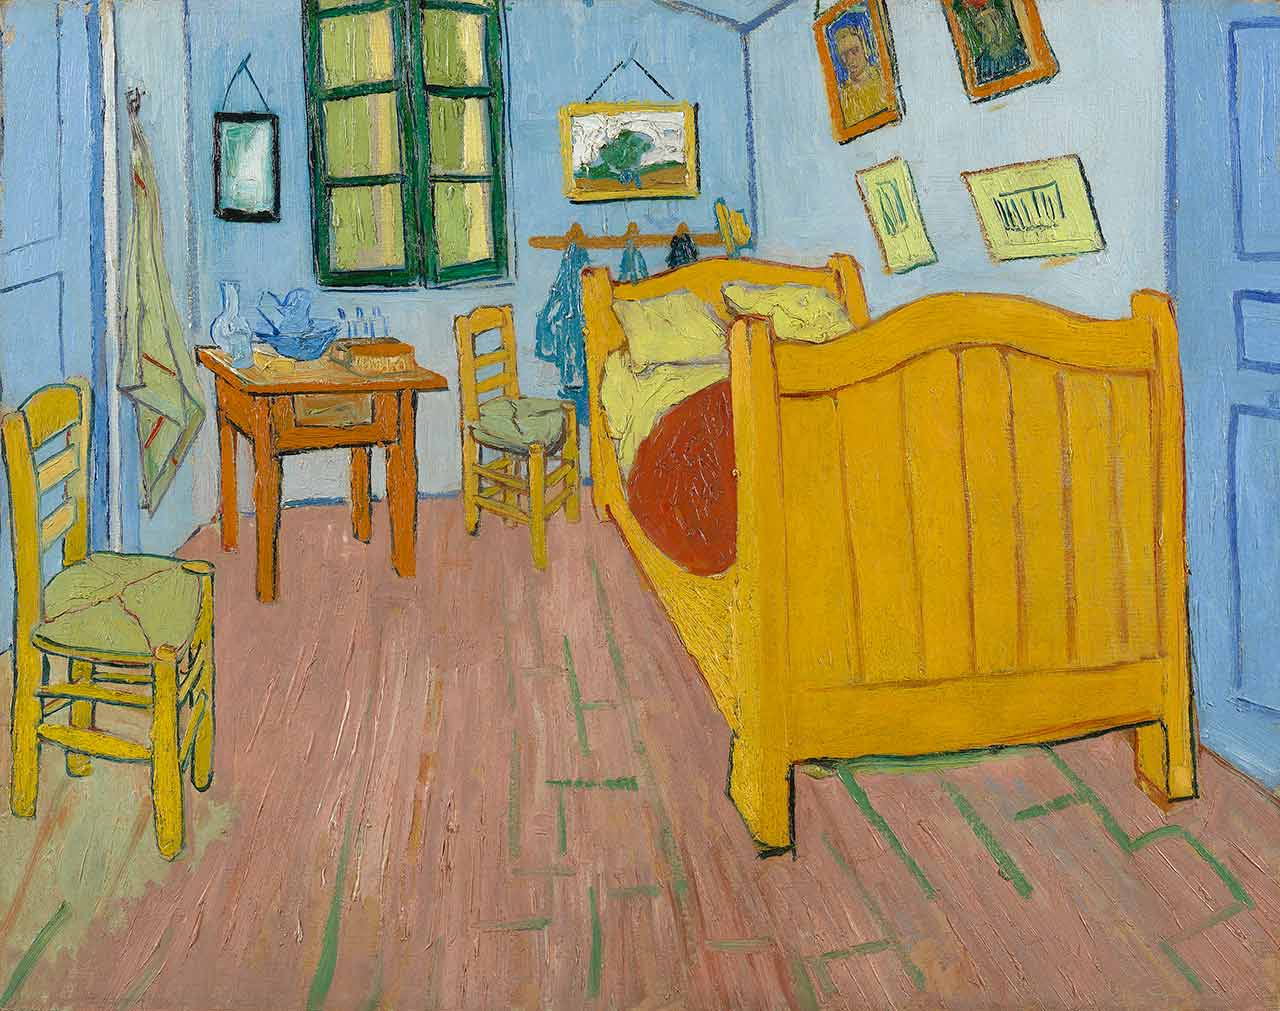 8-Van-Gogh_The-Bedroom_1888_Version-1